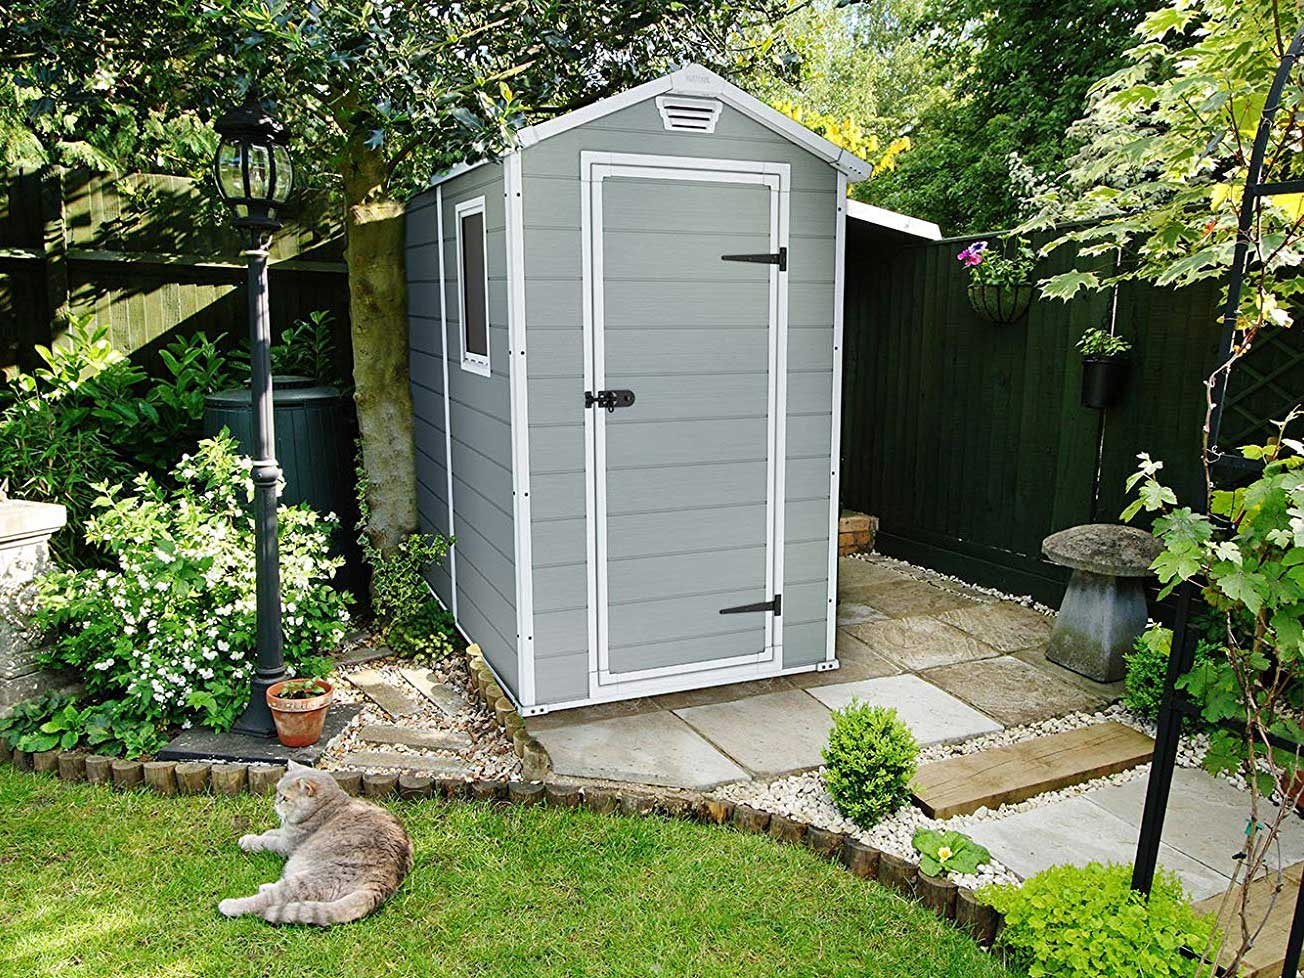 Storage shed in backyard.